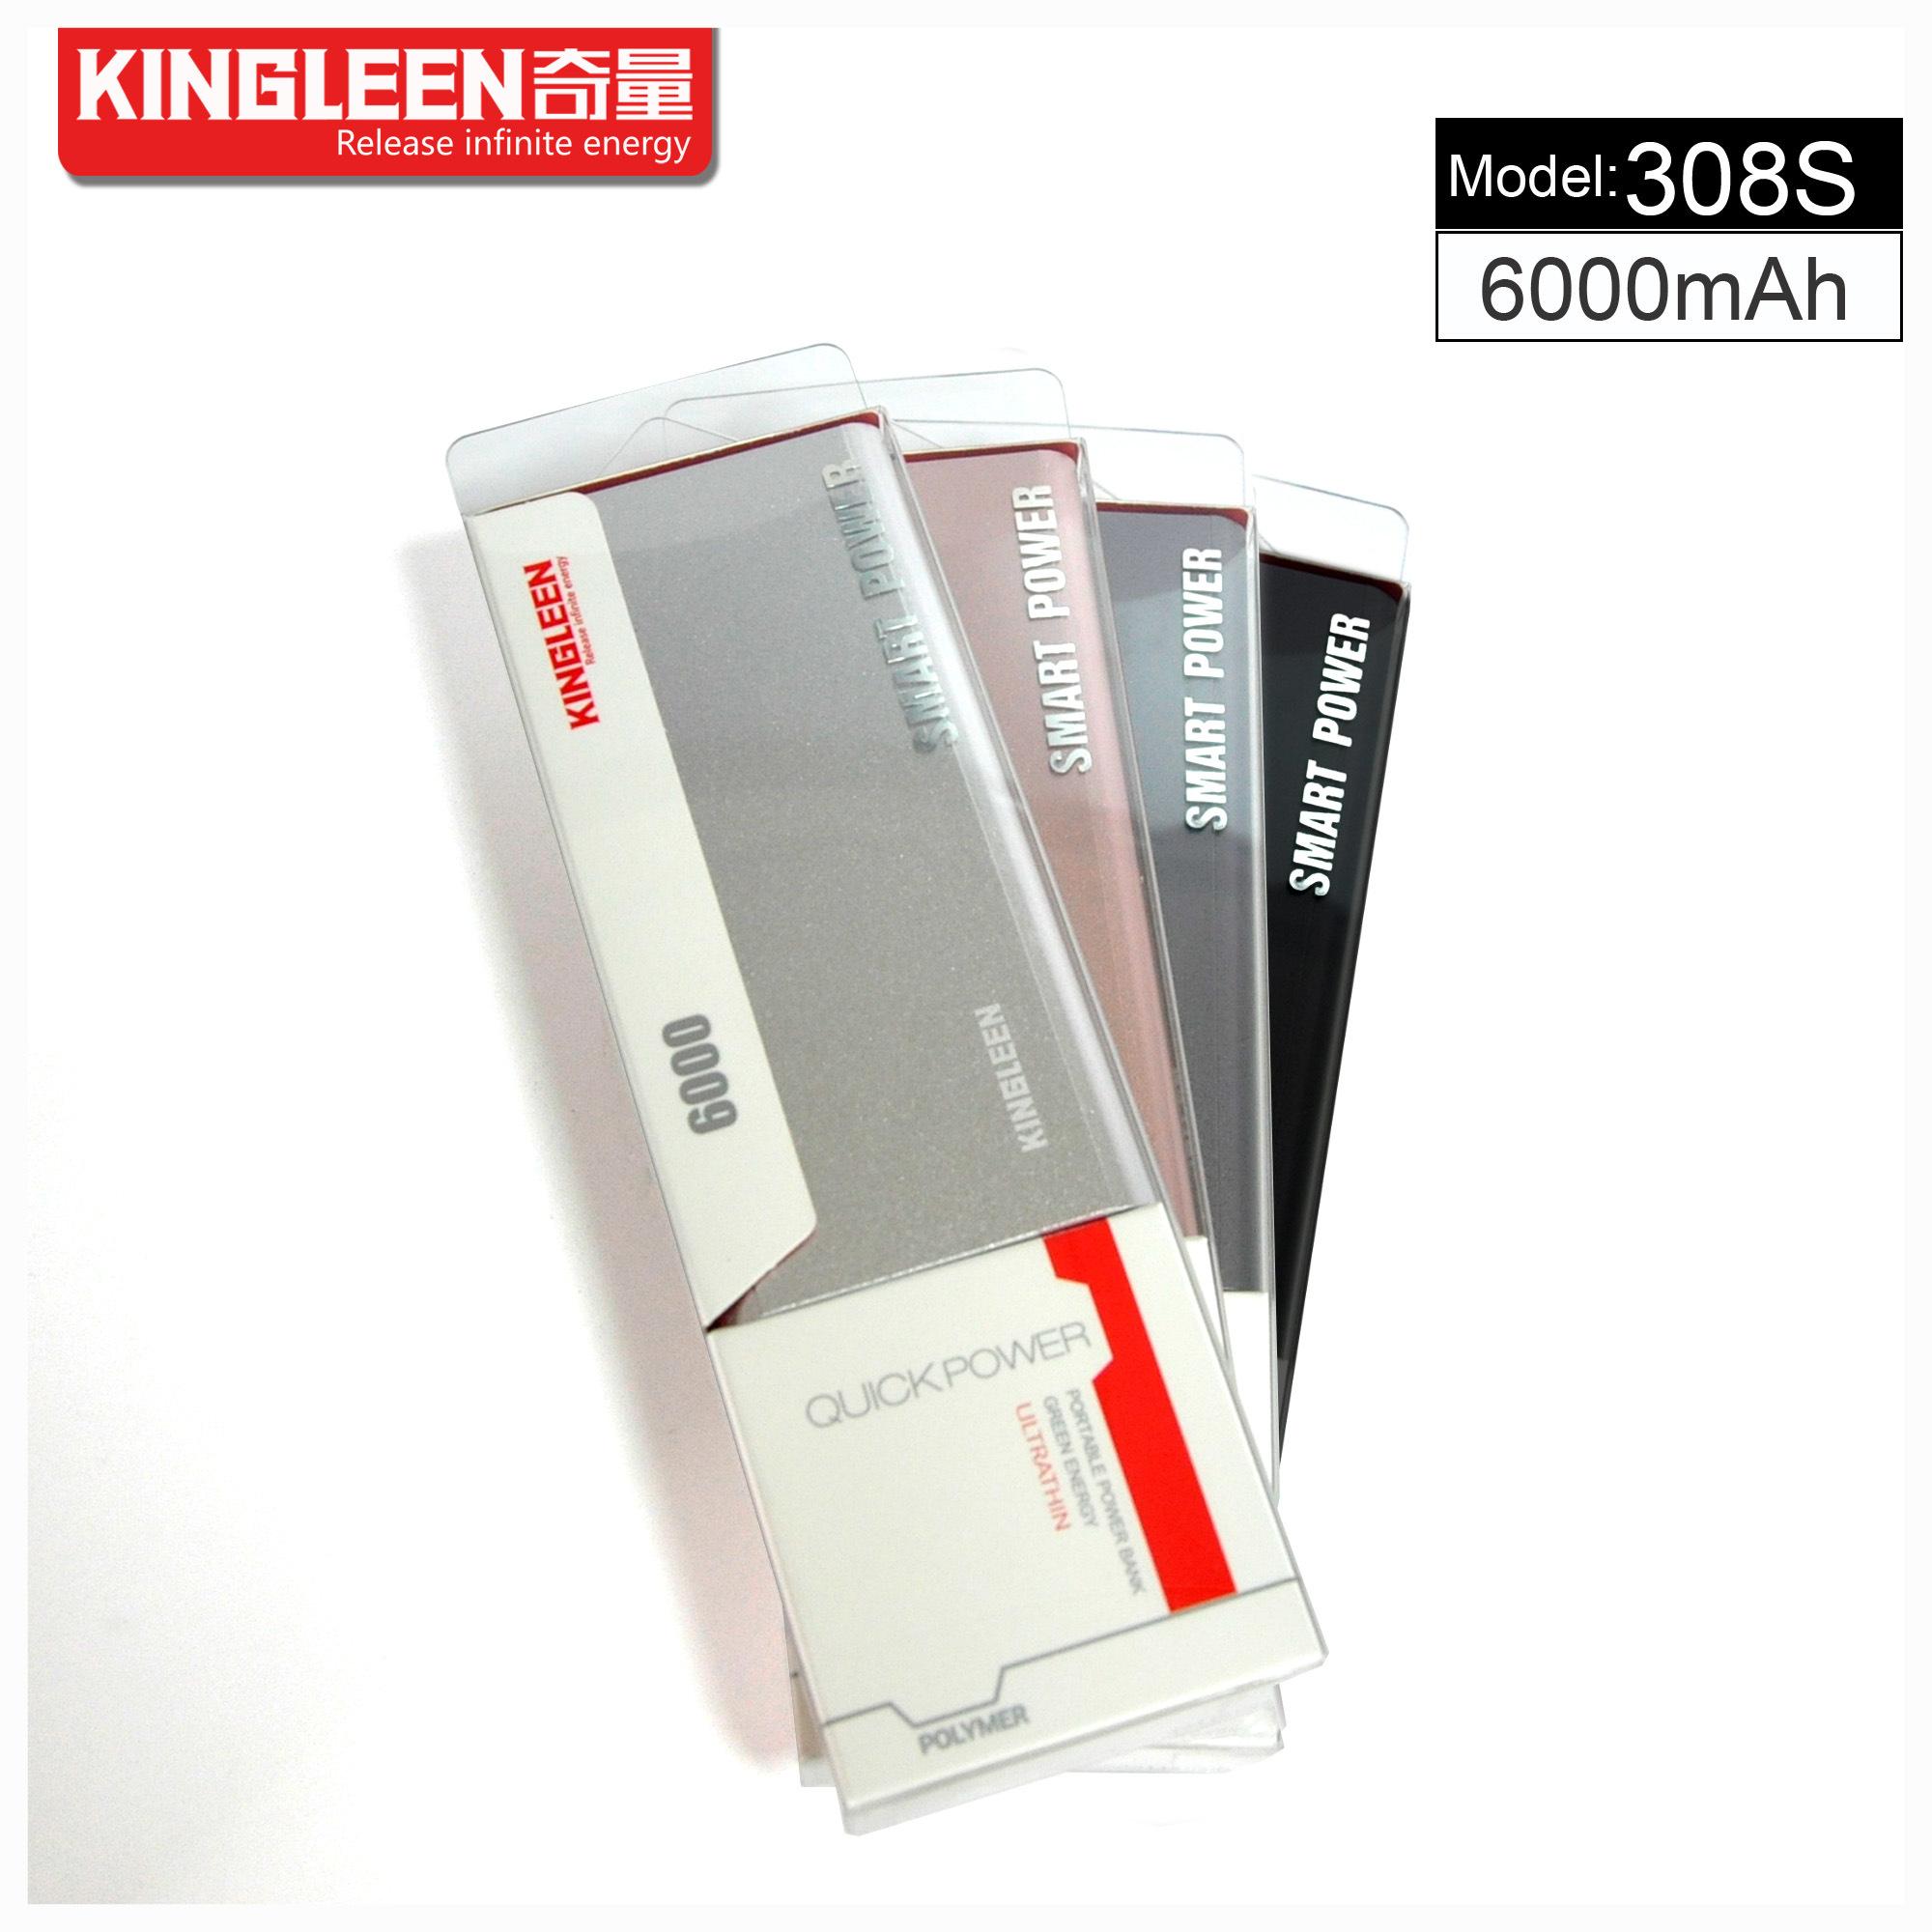 Kingleen Model C308s Power Bank 6000mAh Single USB 1A Output Factory Direct Sale